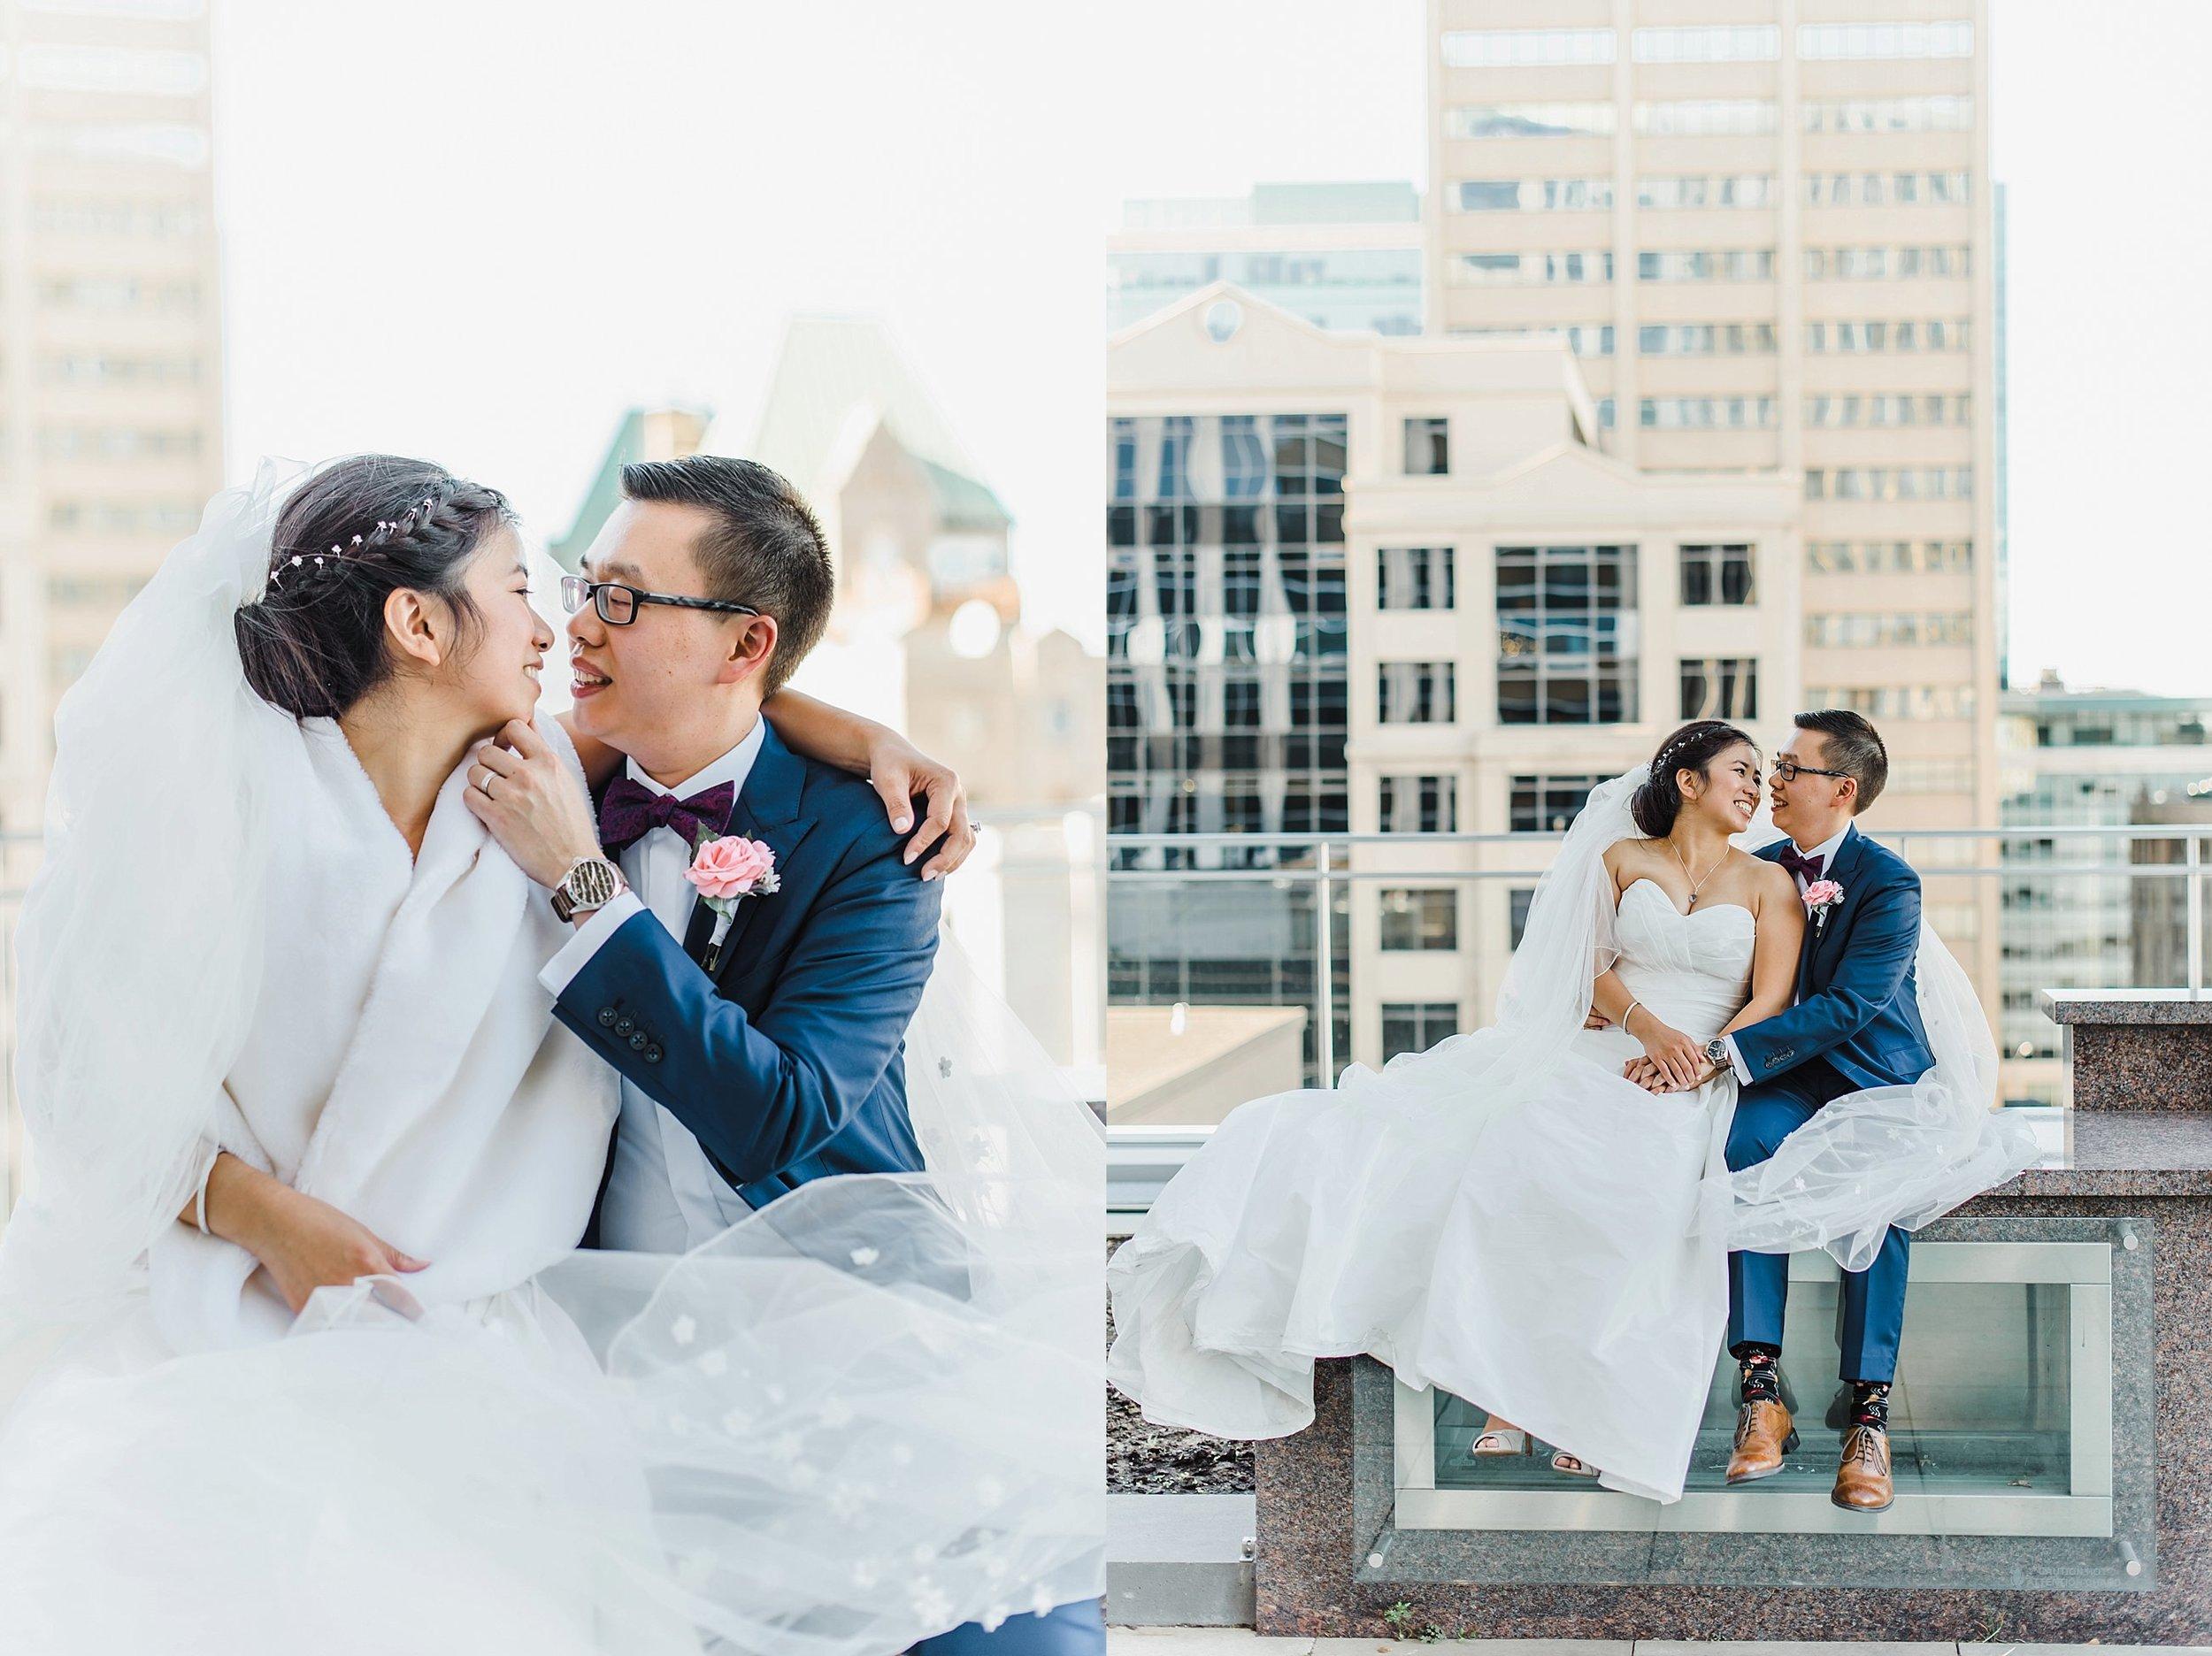 light airy indie fine art ottawa wedding photographer | Ali and Batoul Photography_1524.jpg